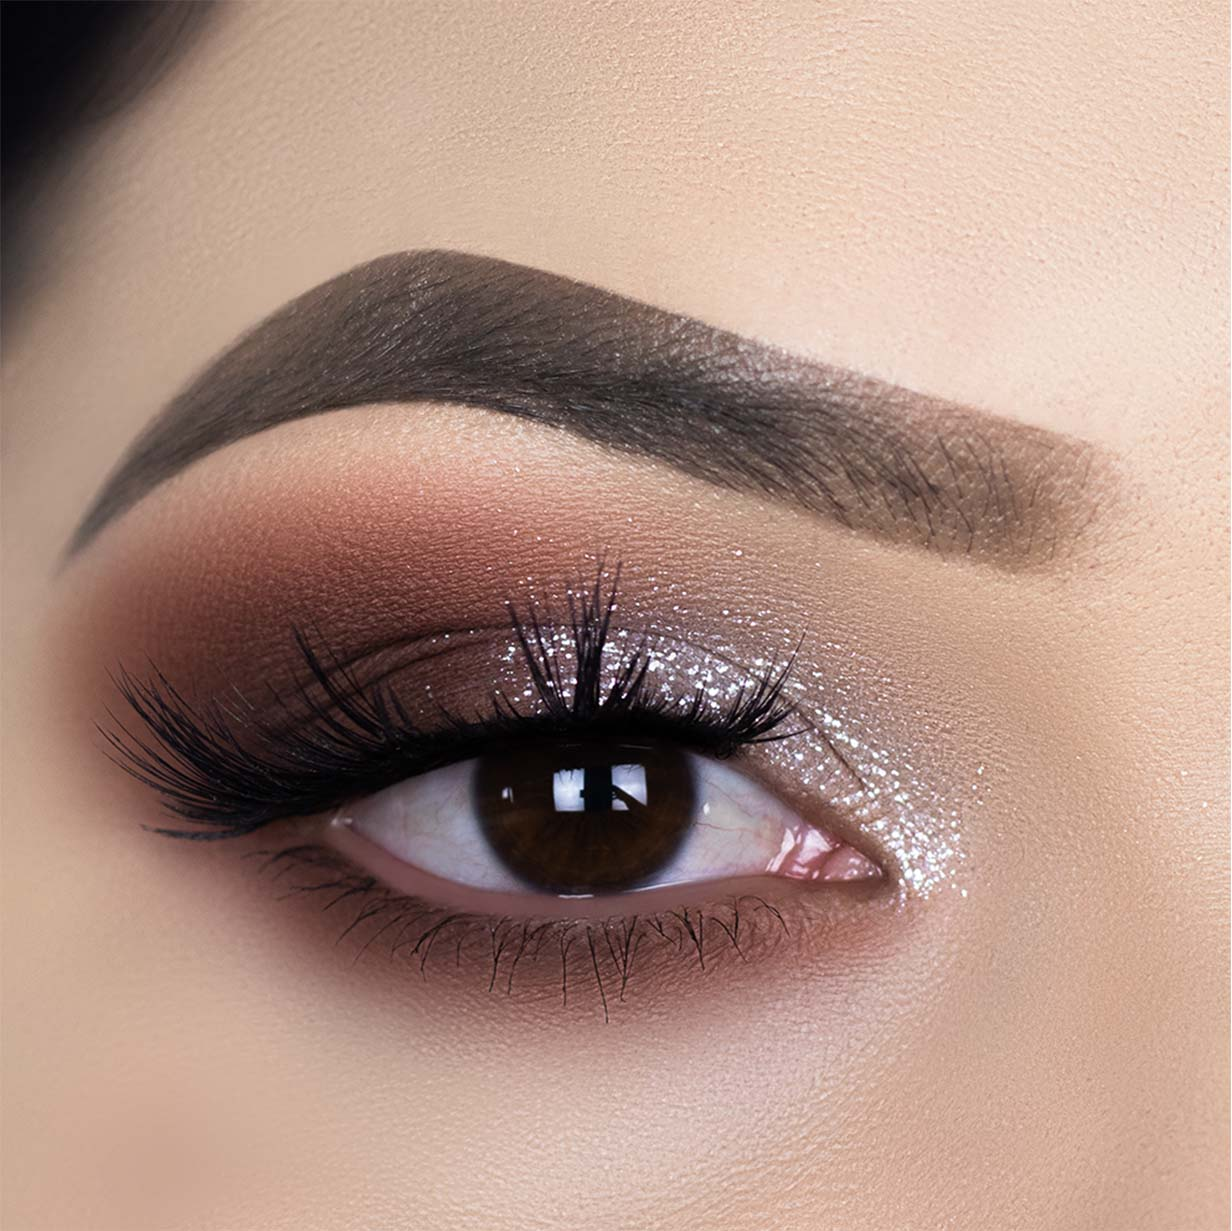 Asa de Borboleta Pigmento Suelen Makeup Istambul  - SUELEN MAKEUP